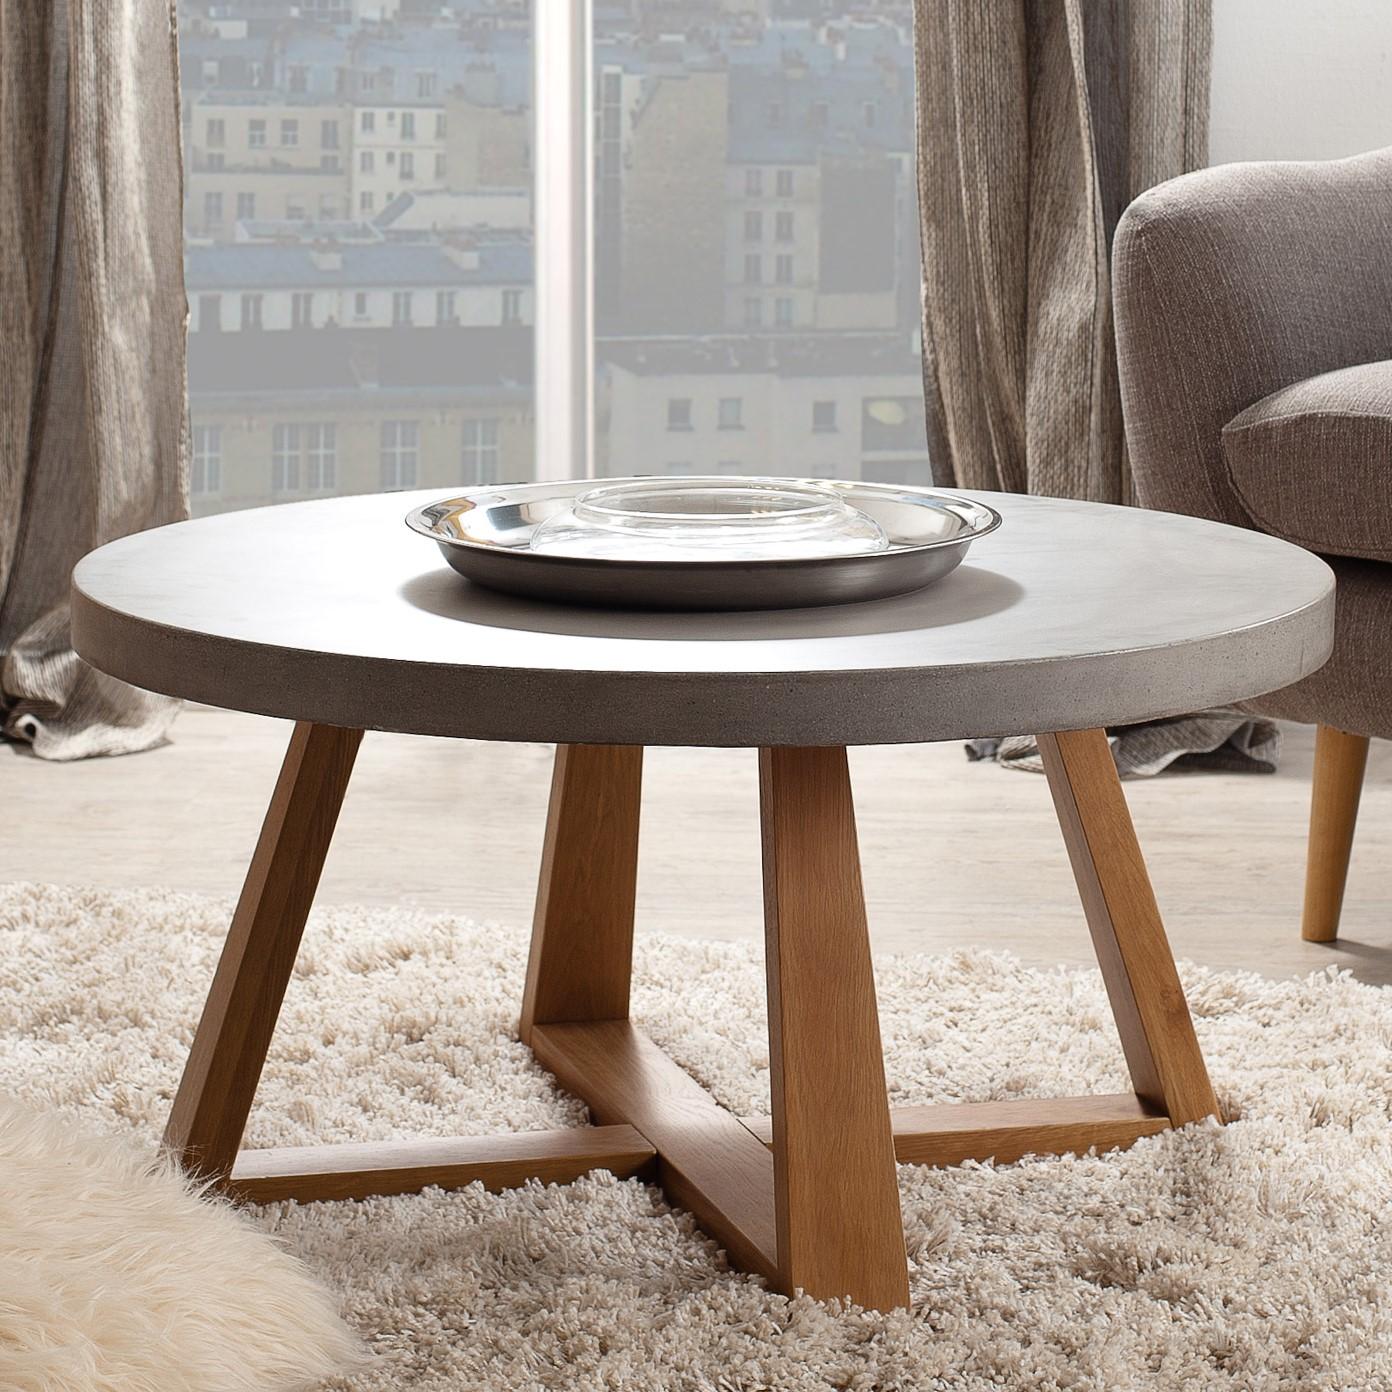 basse Table chêne ronde D91 et béton FERRER 4j5RAL